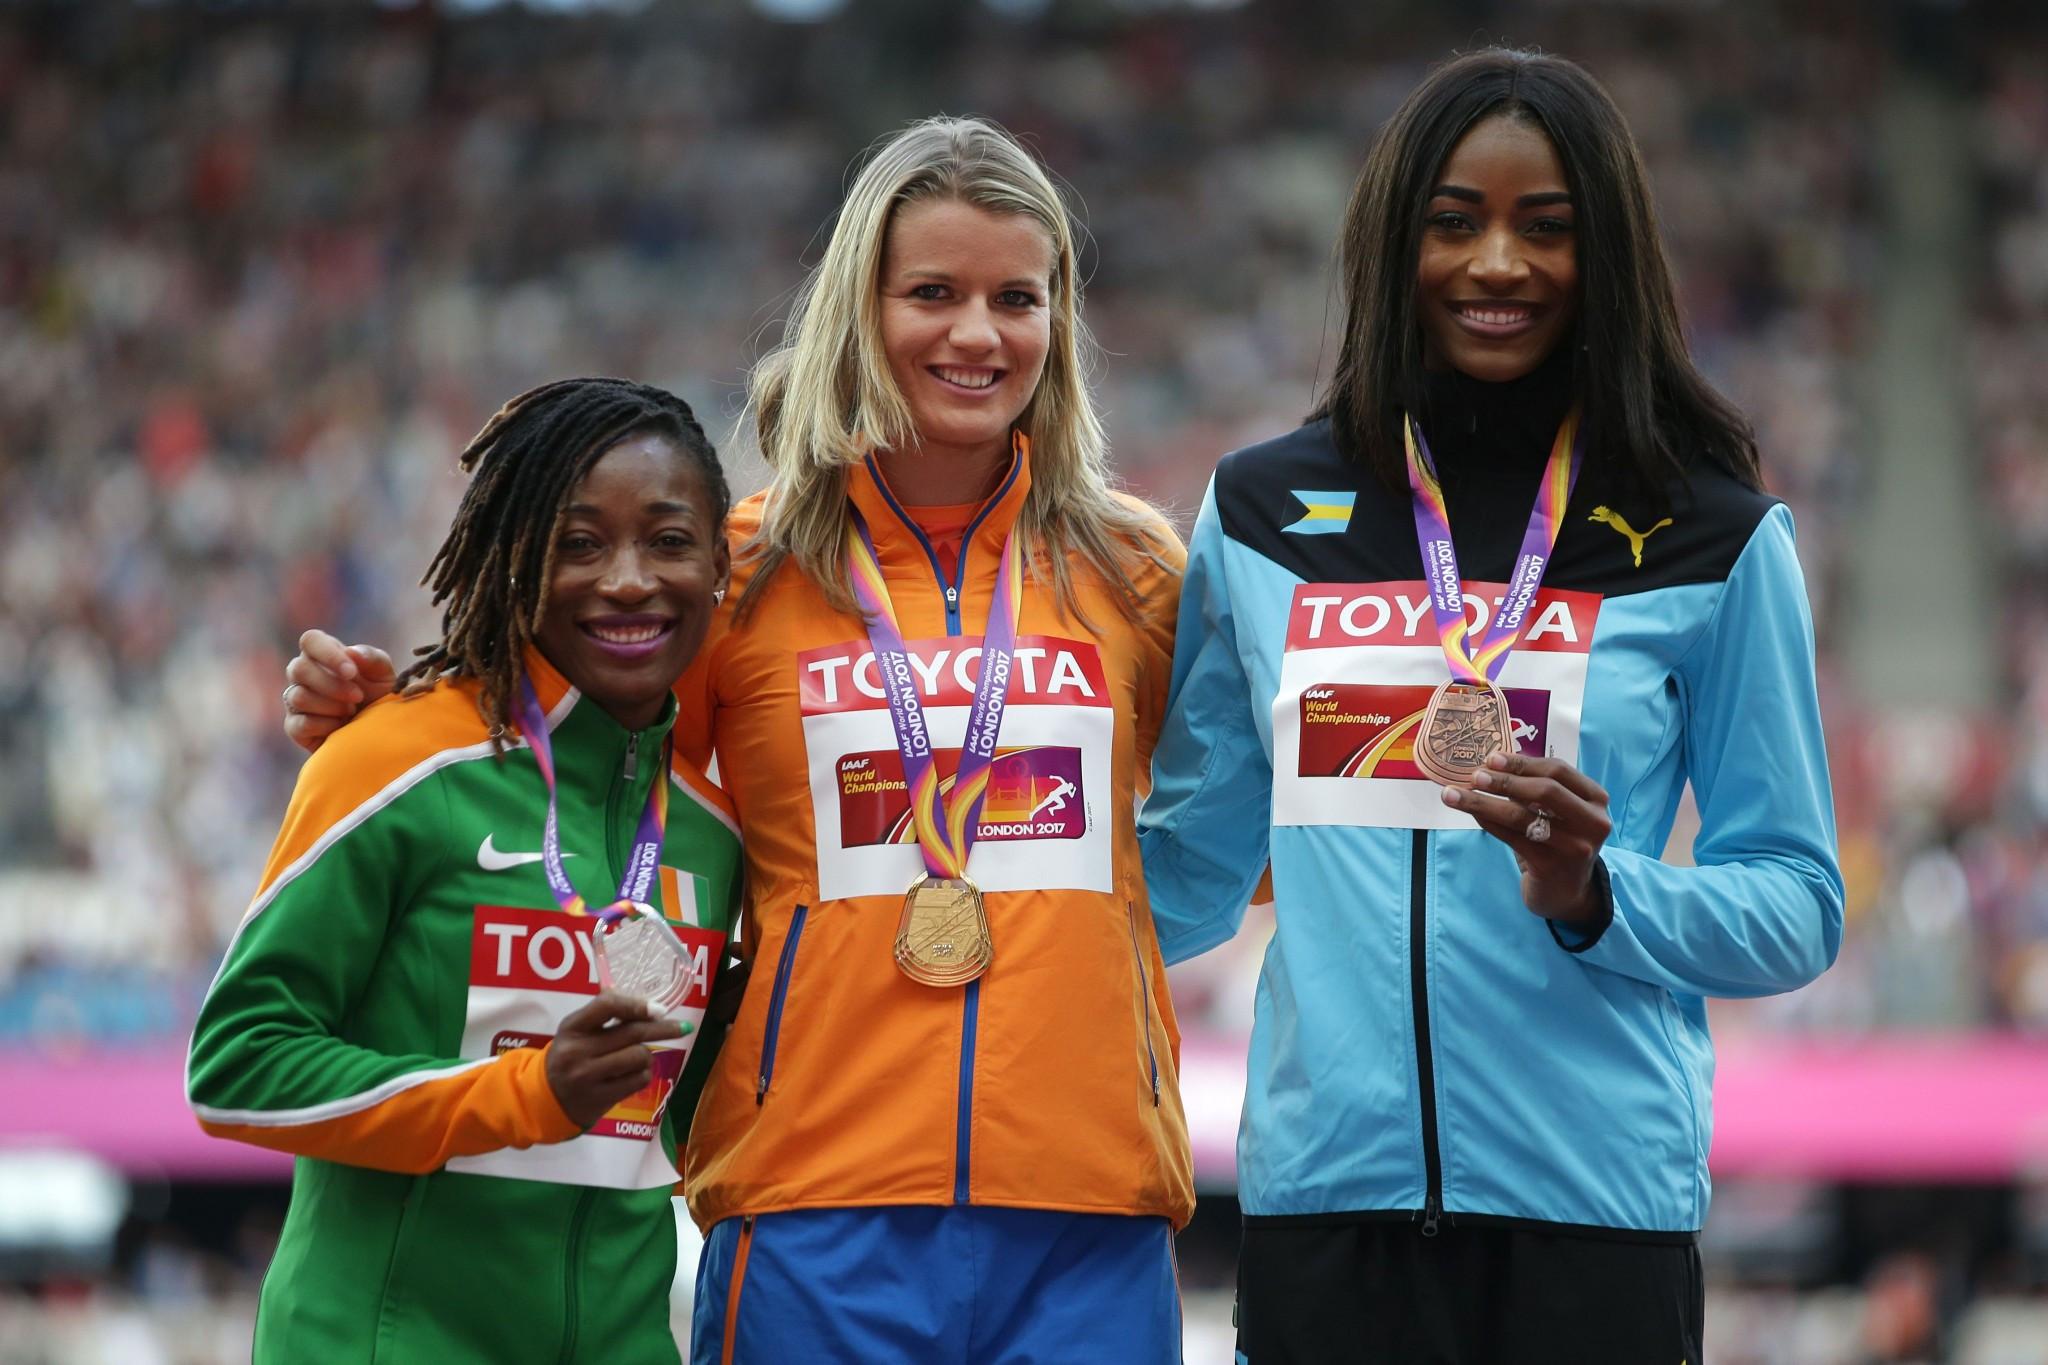 World champions gather for Birmingham's IAAF Diamond League meeting